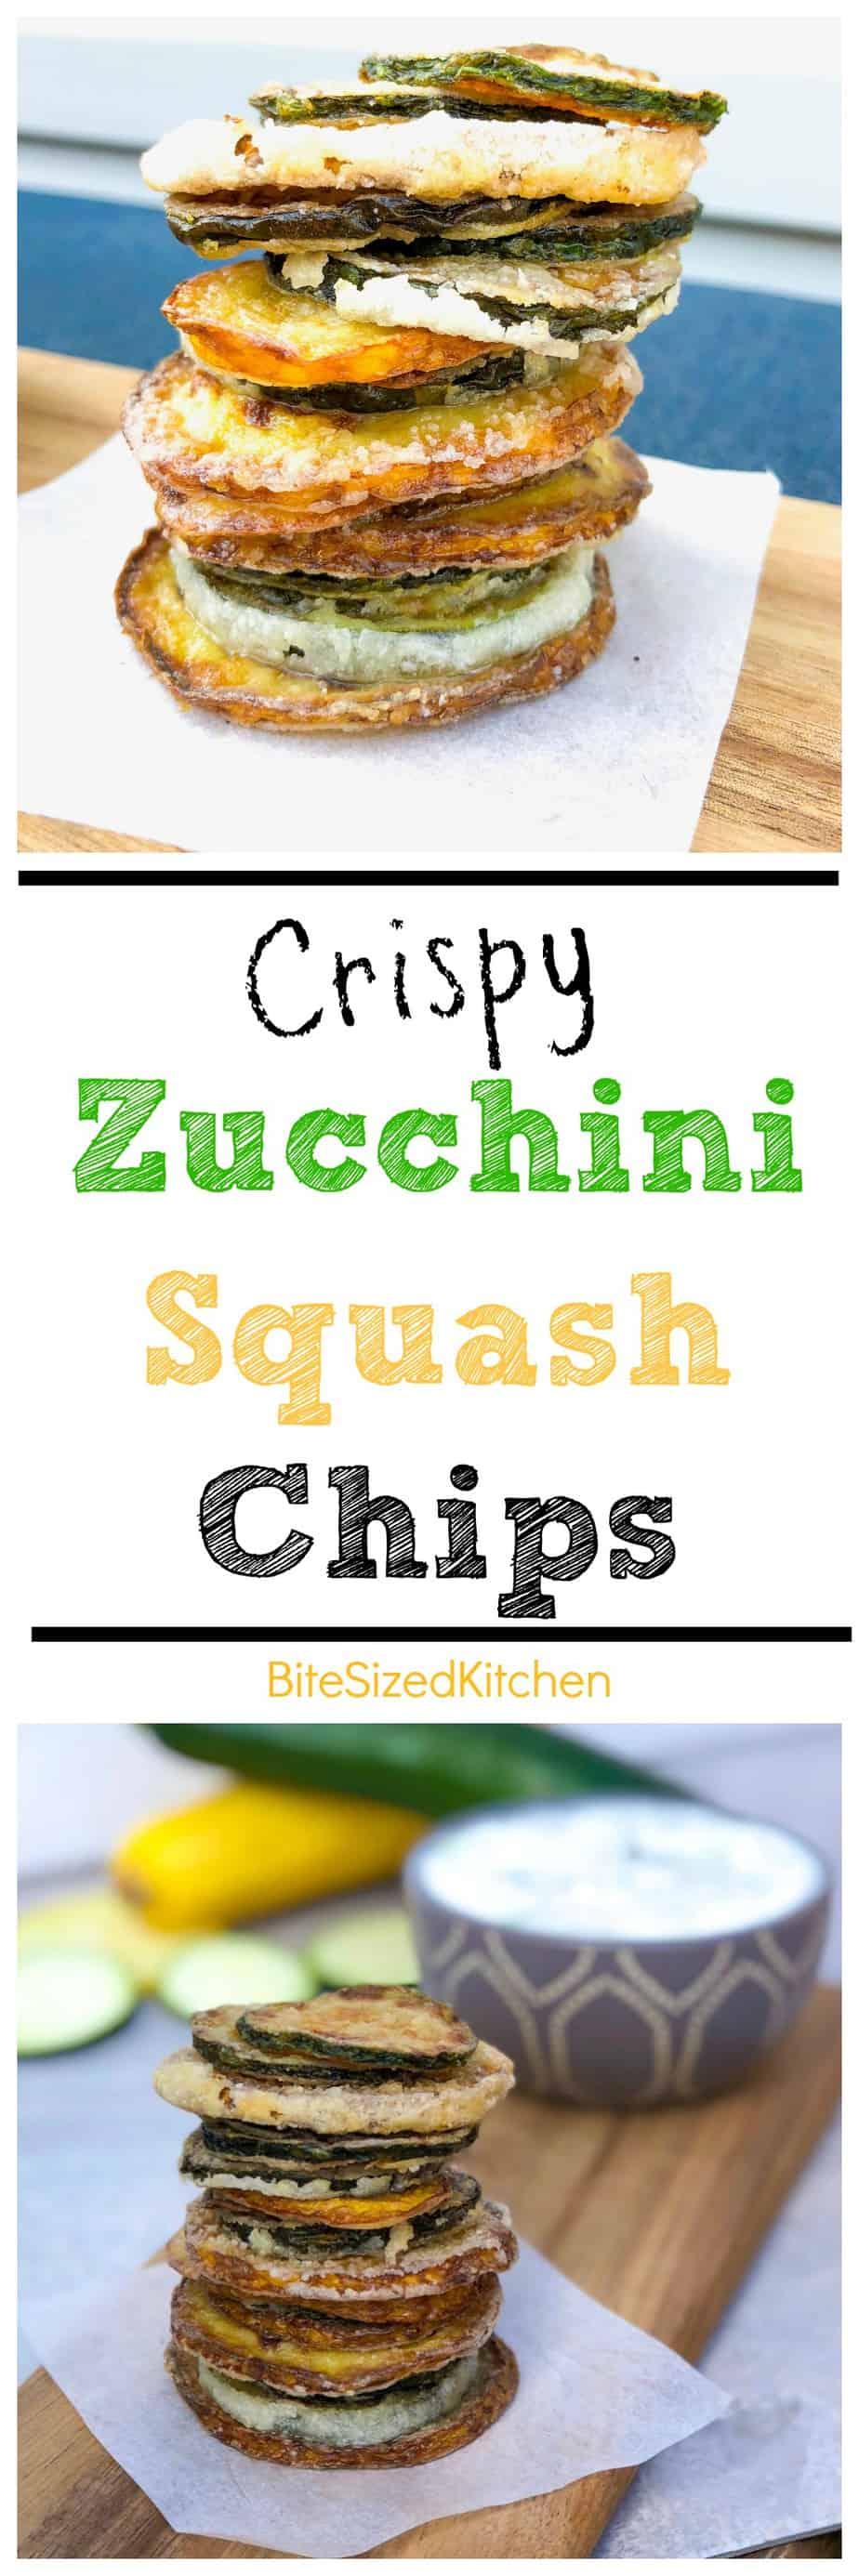 Crispy Zucchini Chips | Fried Zucchini Chips | Easy Zucchini Chips | Tasty Quick Zucchini Chips | Crunchy Zucchini Chips | Gluten free Chips | The best zucchini chips | Crispy fried squash chips | Veggie Chips